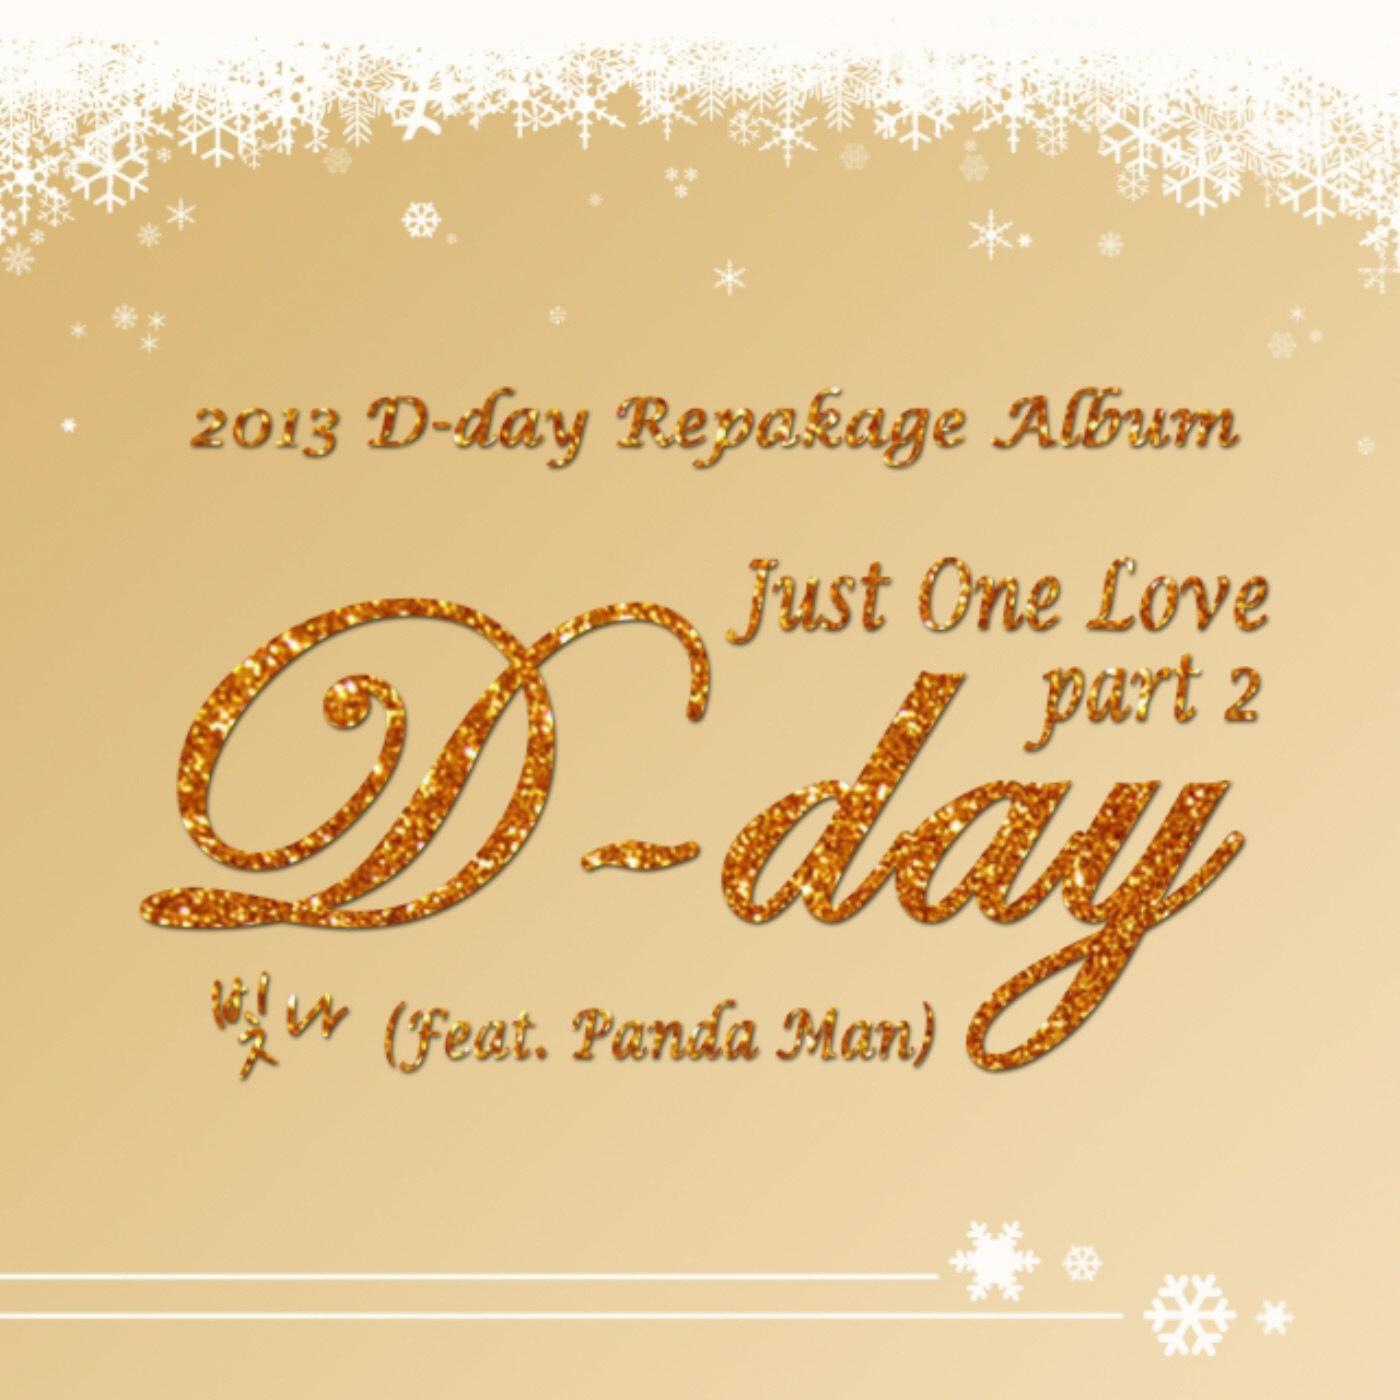 2013 Just One Love Part.2 [Repakage]